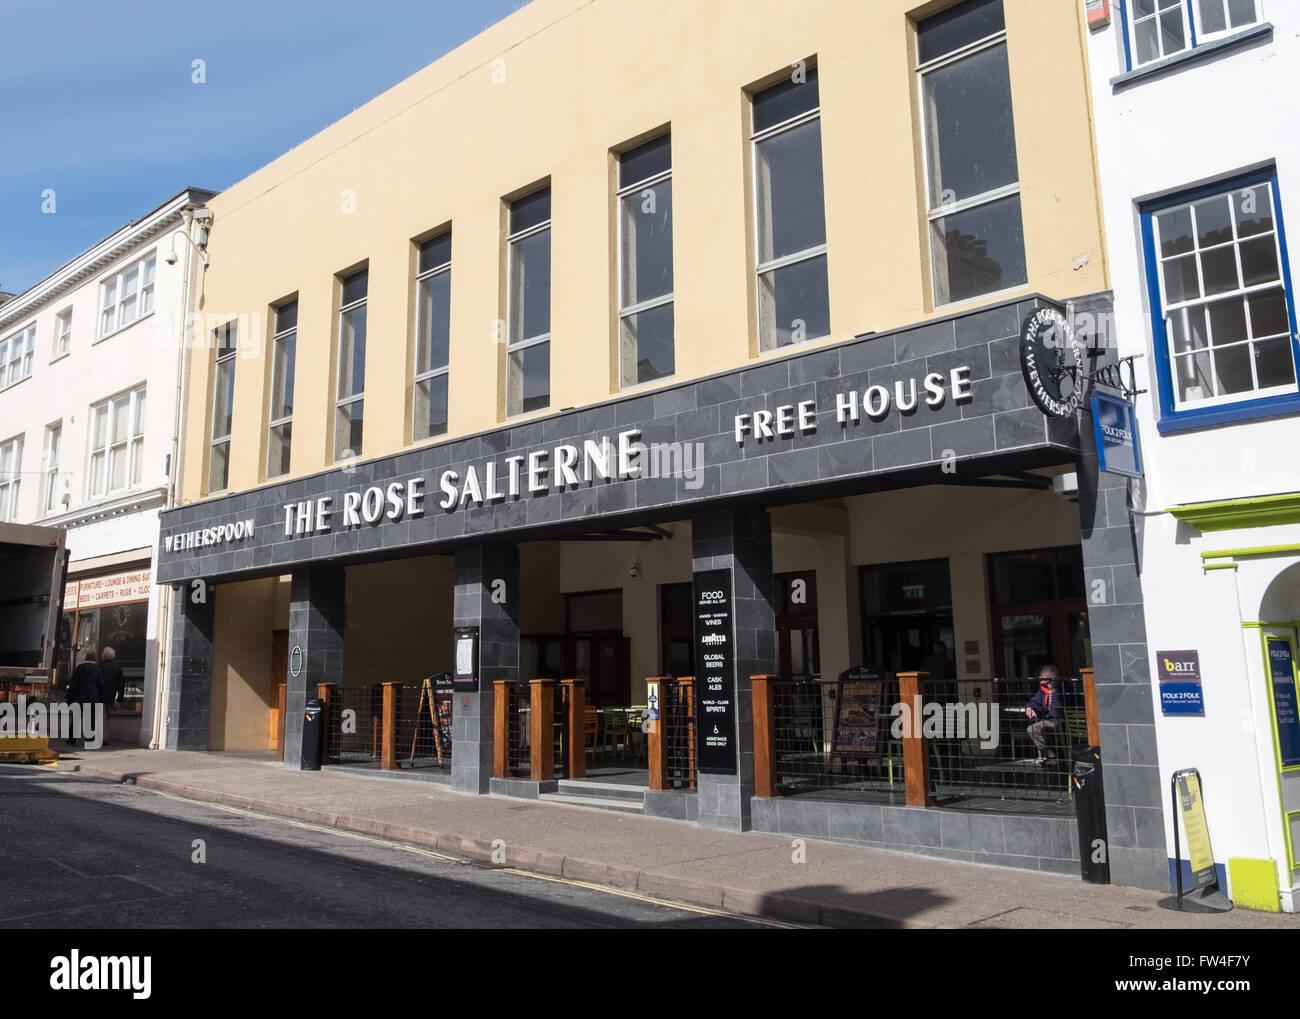 The Rose Salterne pub in Bideford Devon. The Pub is a JD Wetherspoons pub - Stock Image